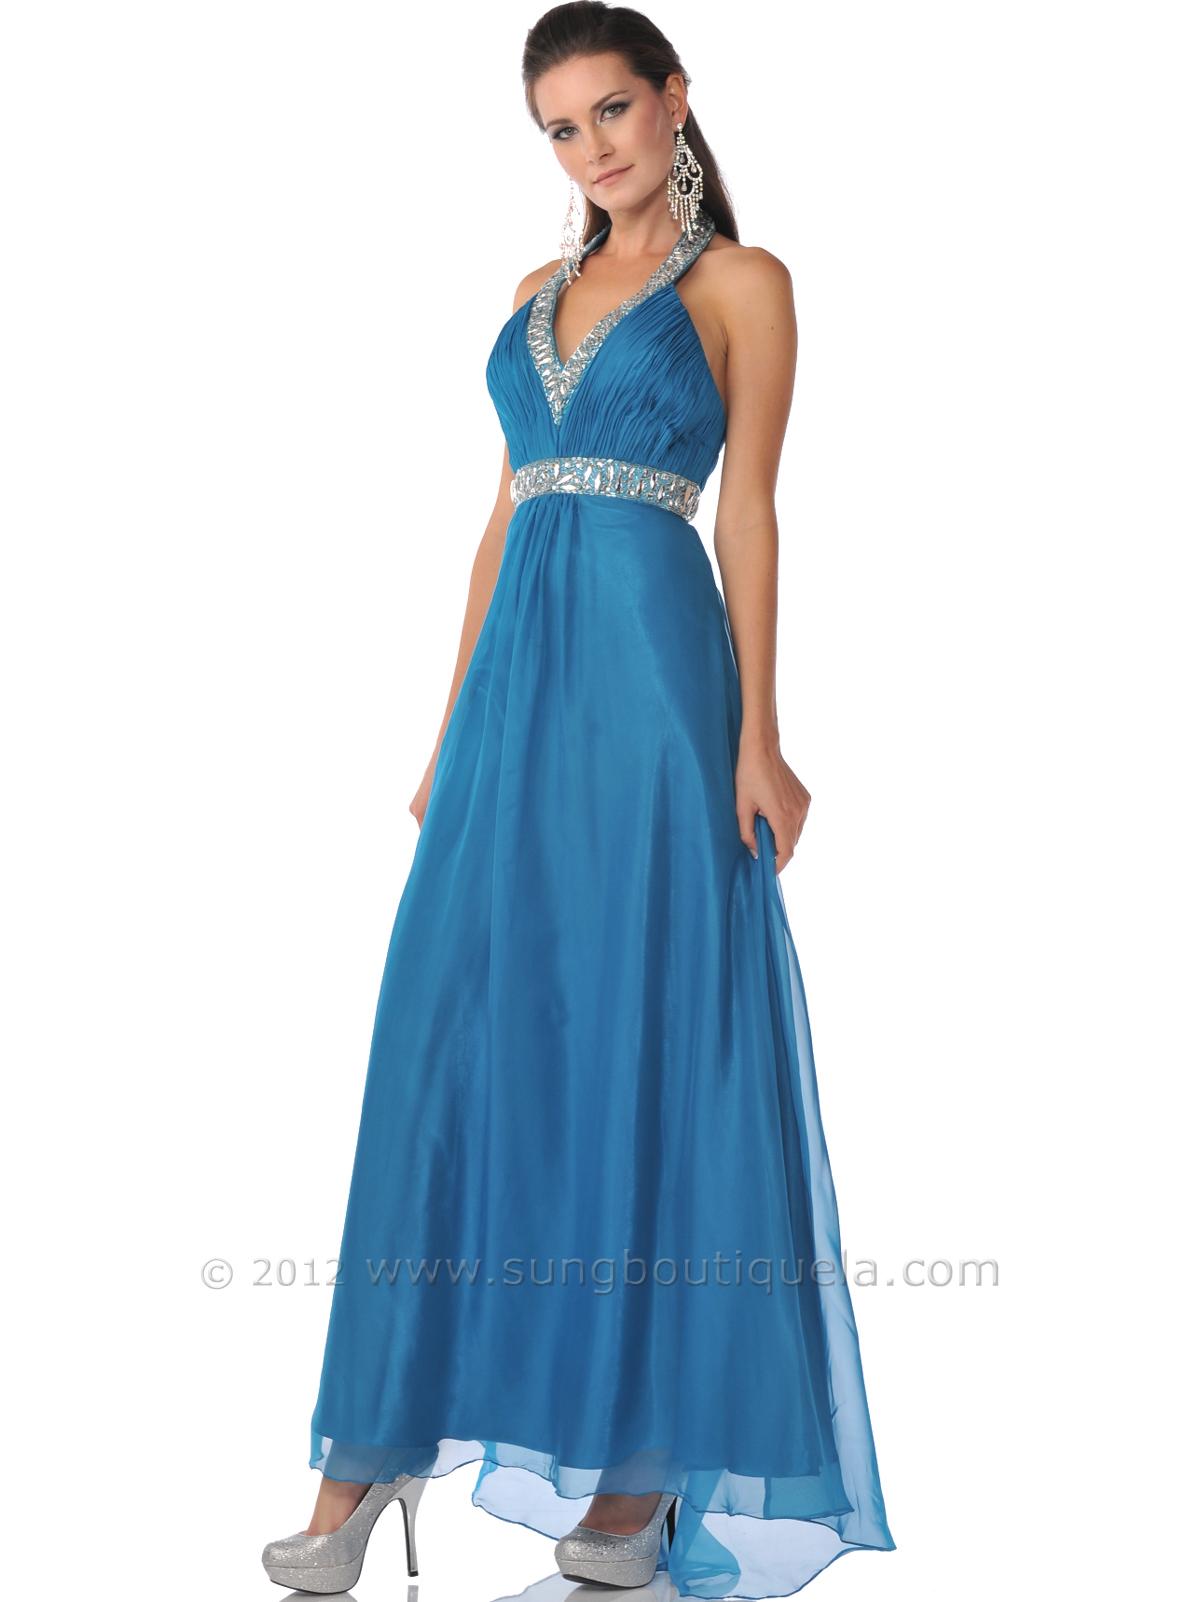 Halter Evening Dresses